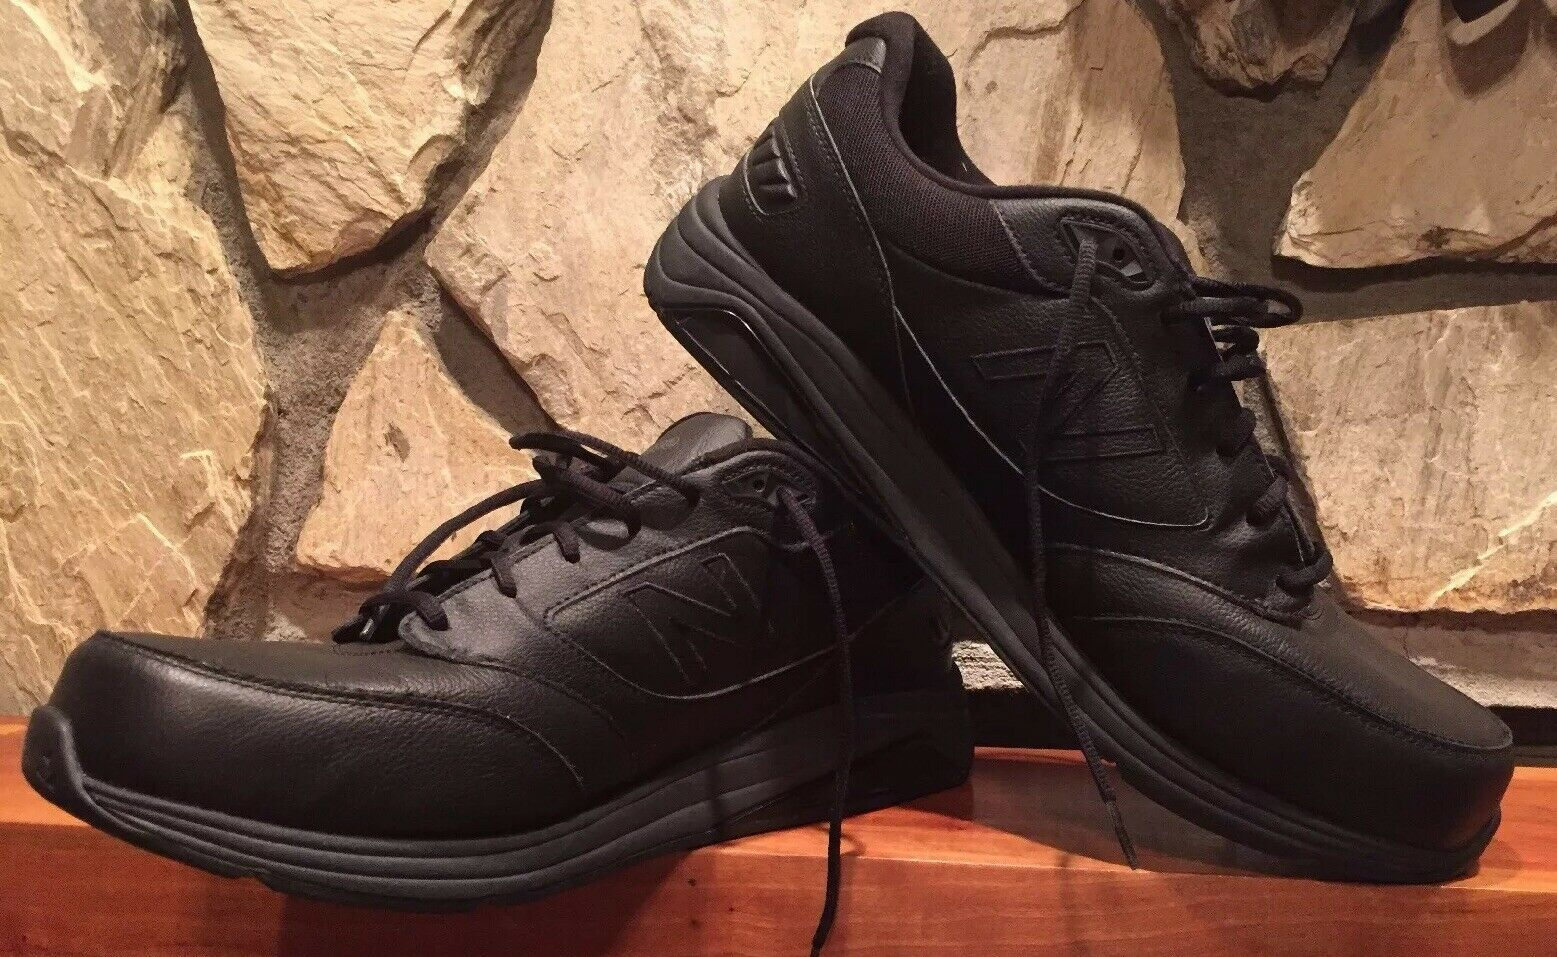 New Balance MW928BK3, size 16 4E black walking shoes 2018 Rollbar Nice  928v3